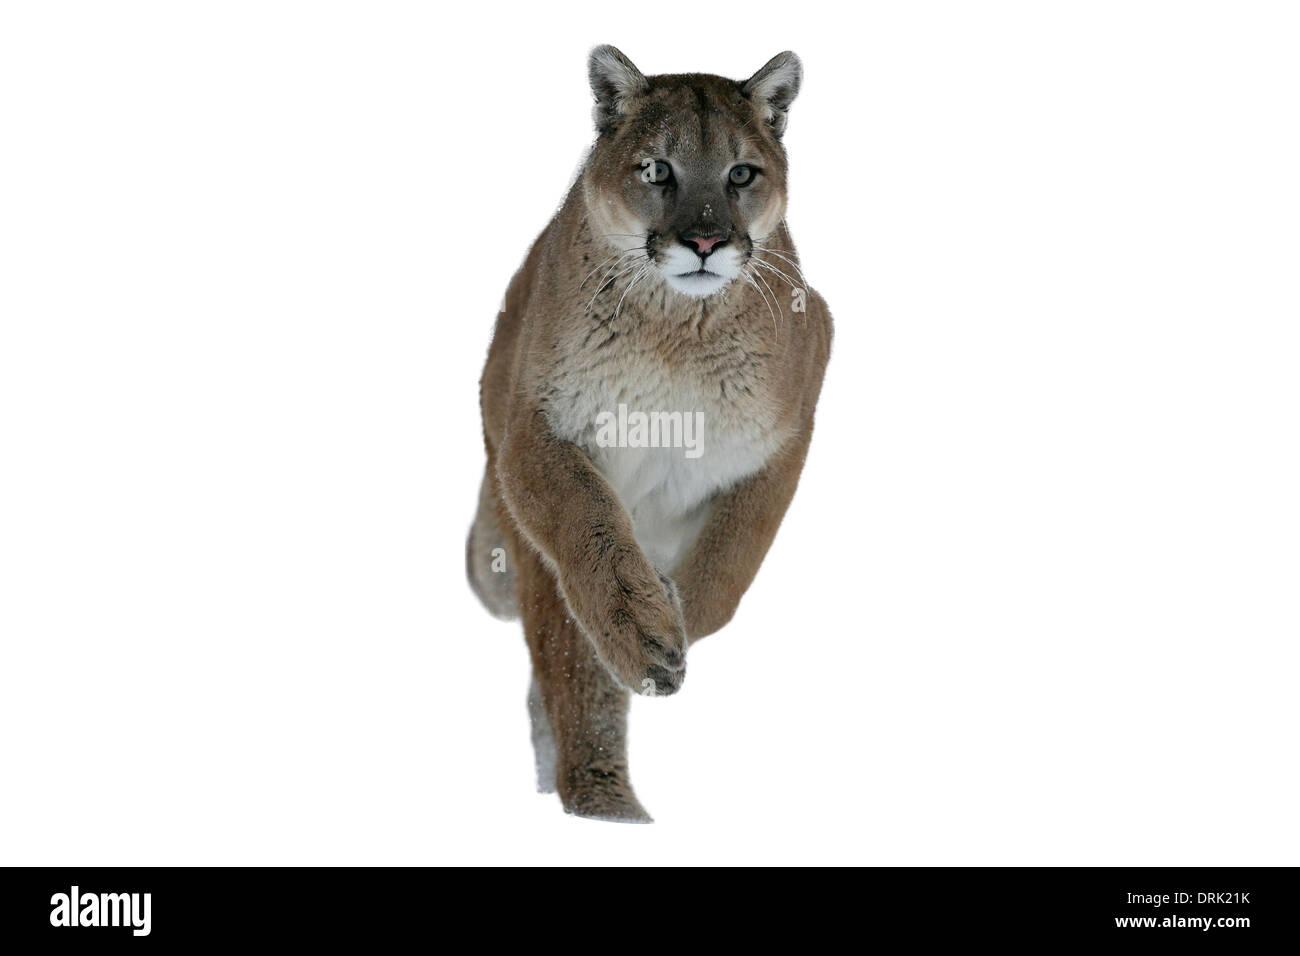 Puma or Mountain lion, Puma concolor, single cat in snow, captive - Stock Image